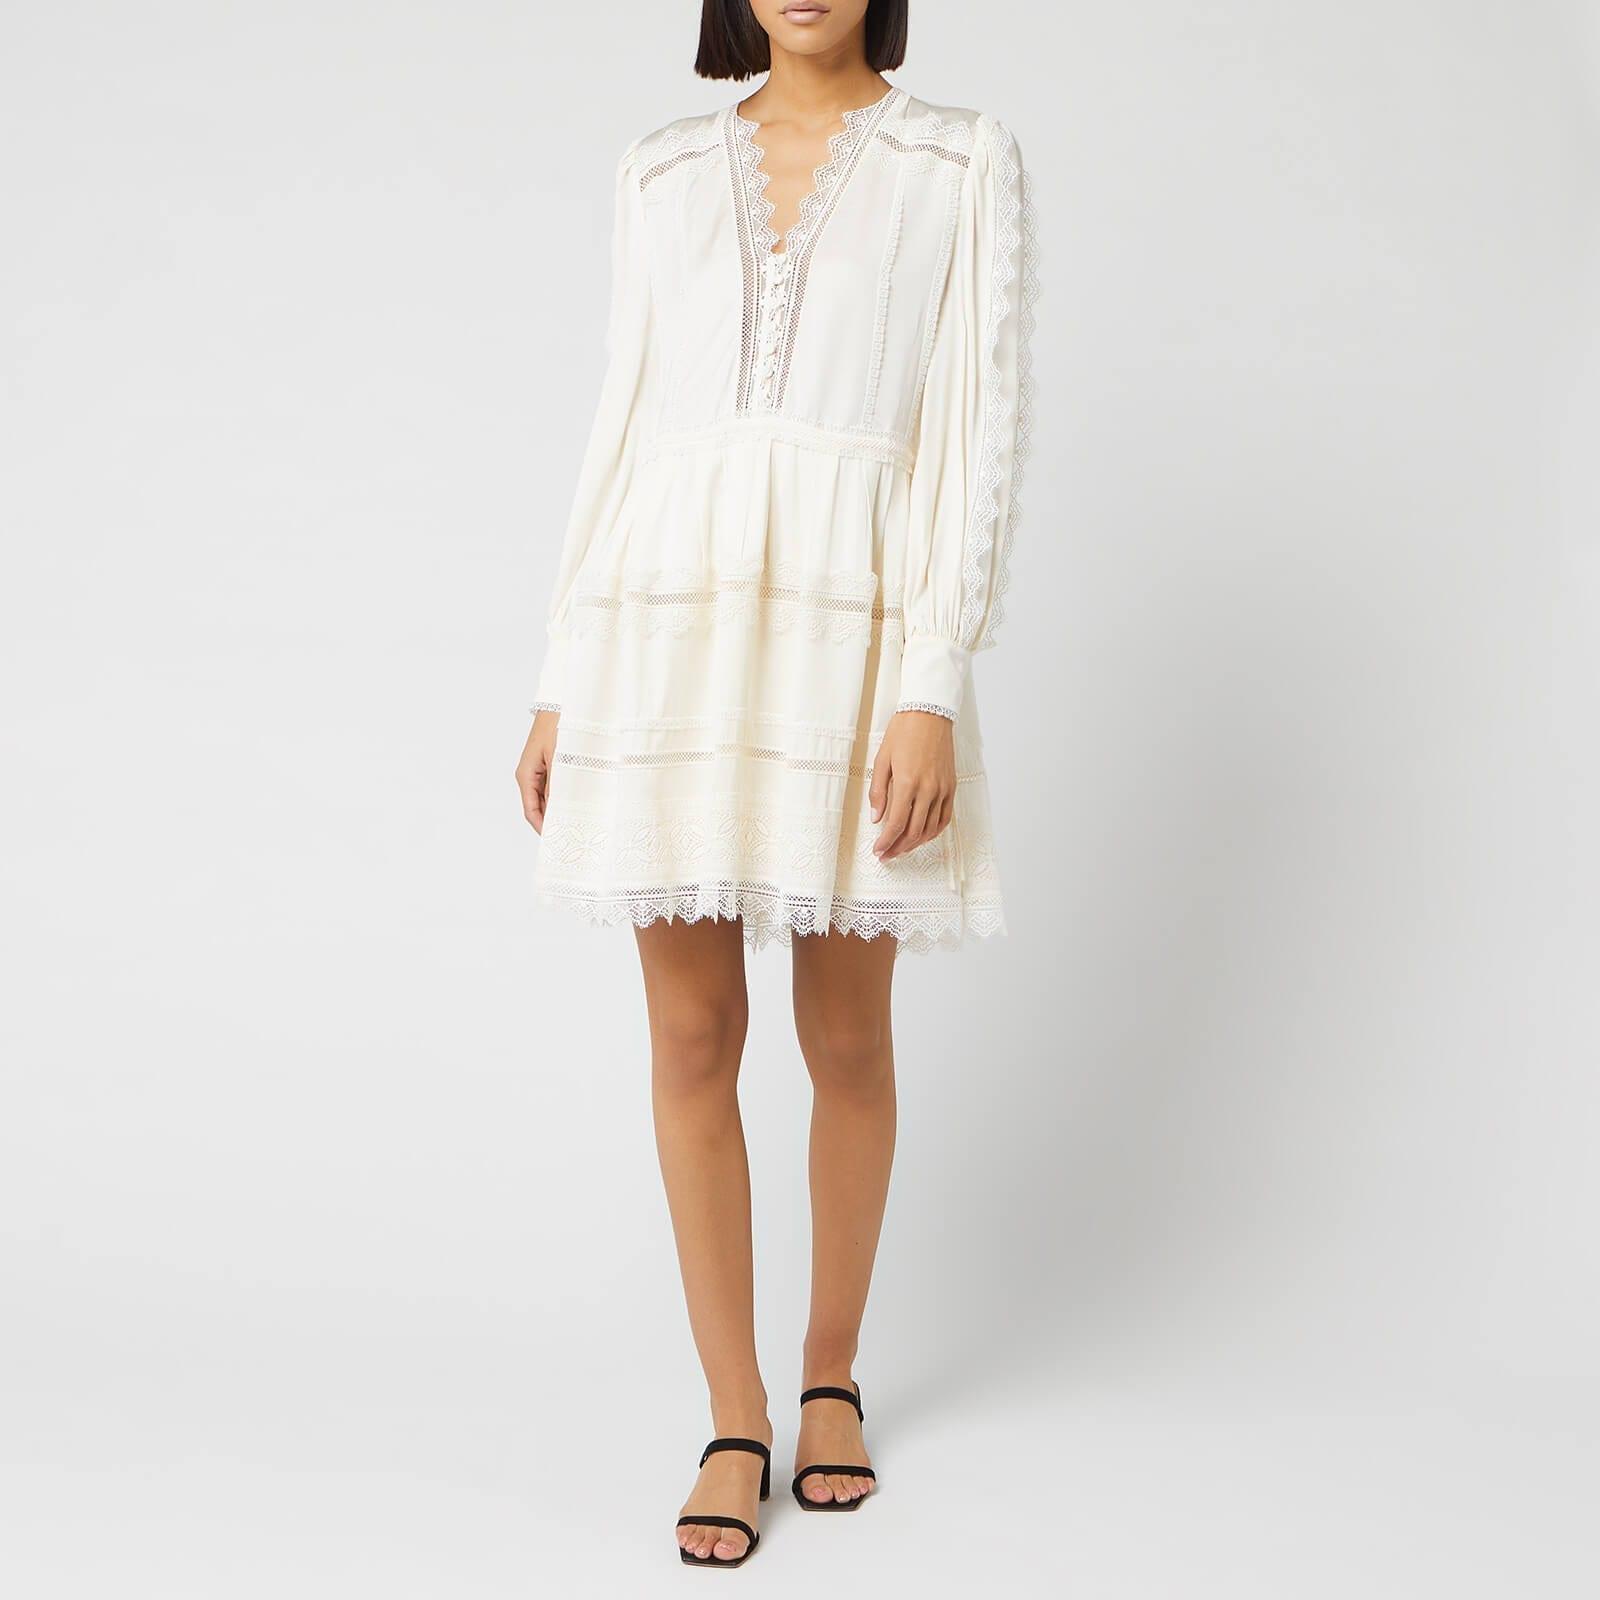 SELF-PORTRAIT Women's Lace Trim Mini Dress